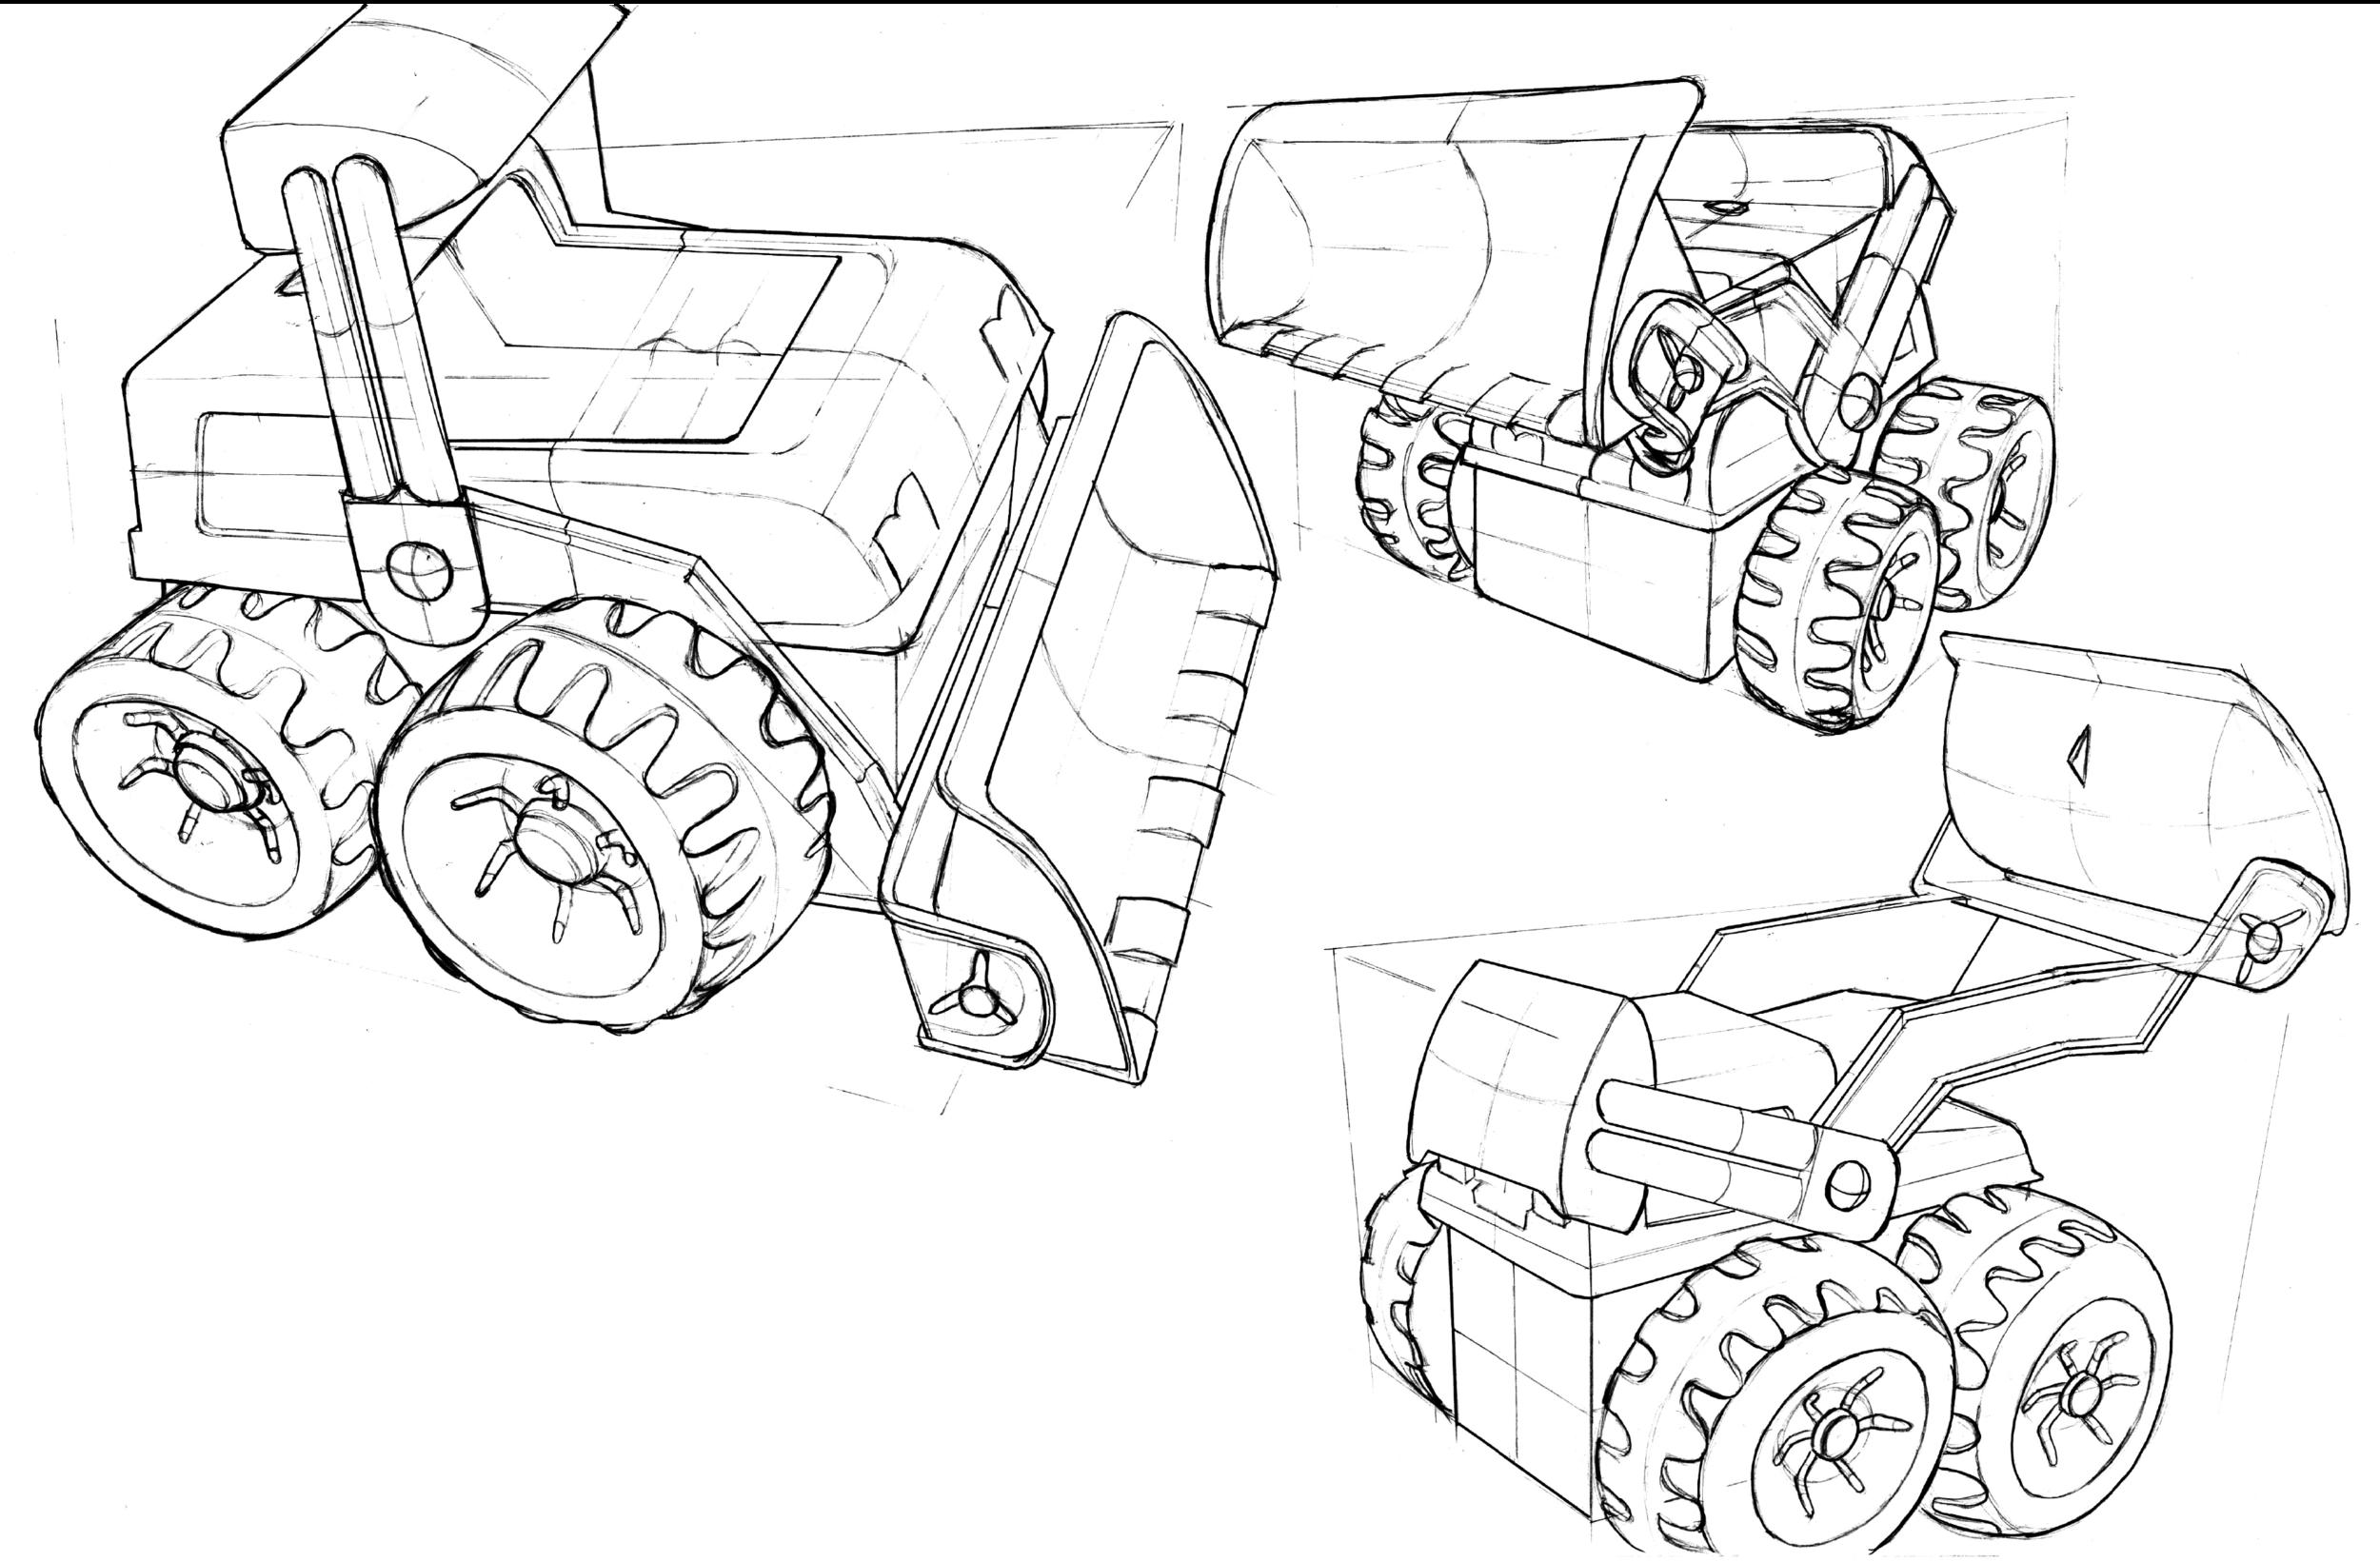 Sketch-06.png